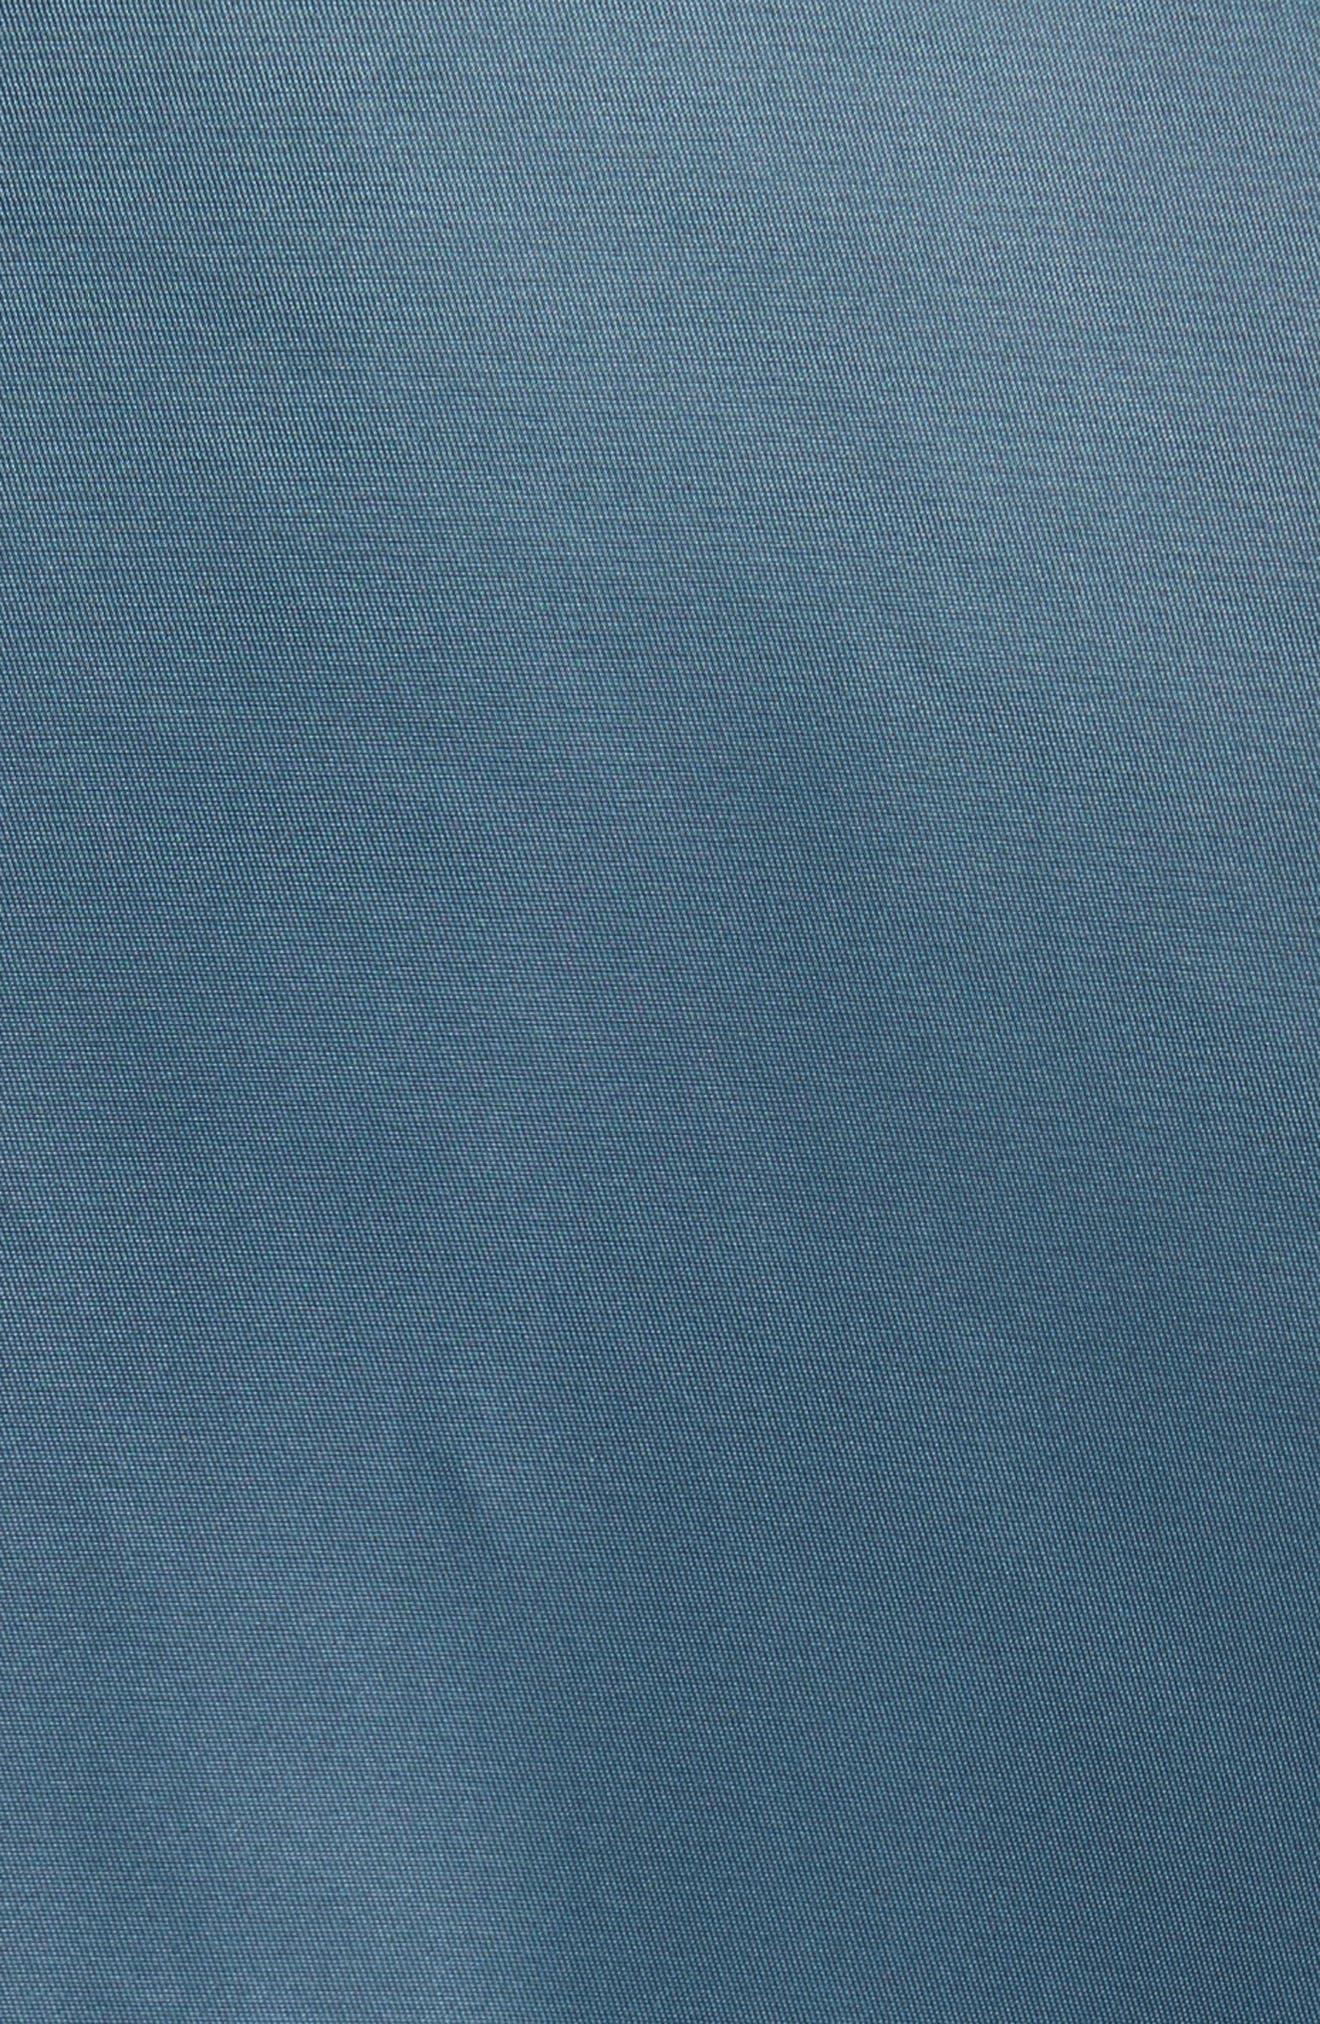 Peter Genuine Shearling Sleeve Jacket,                             Alternate thumbnail 6, color,                             410